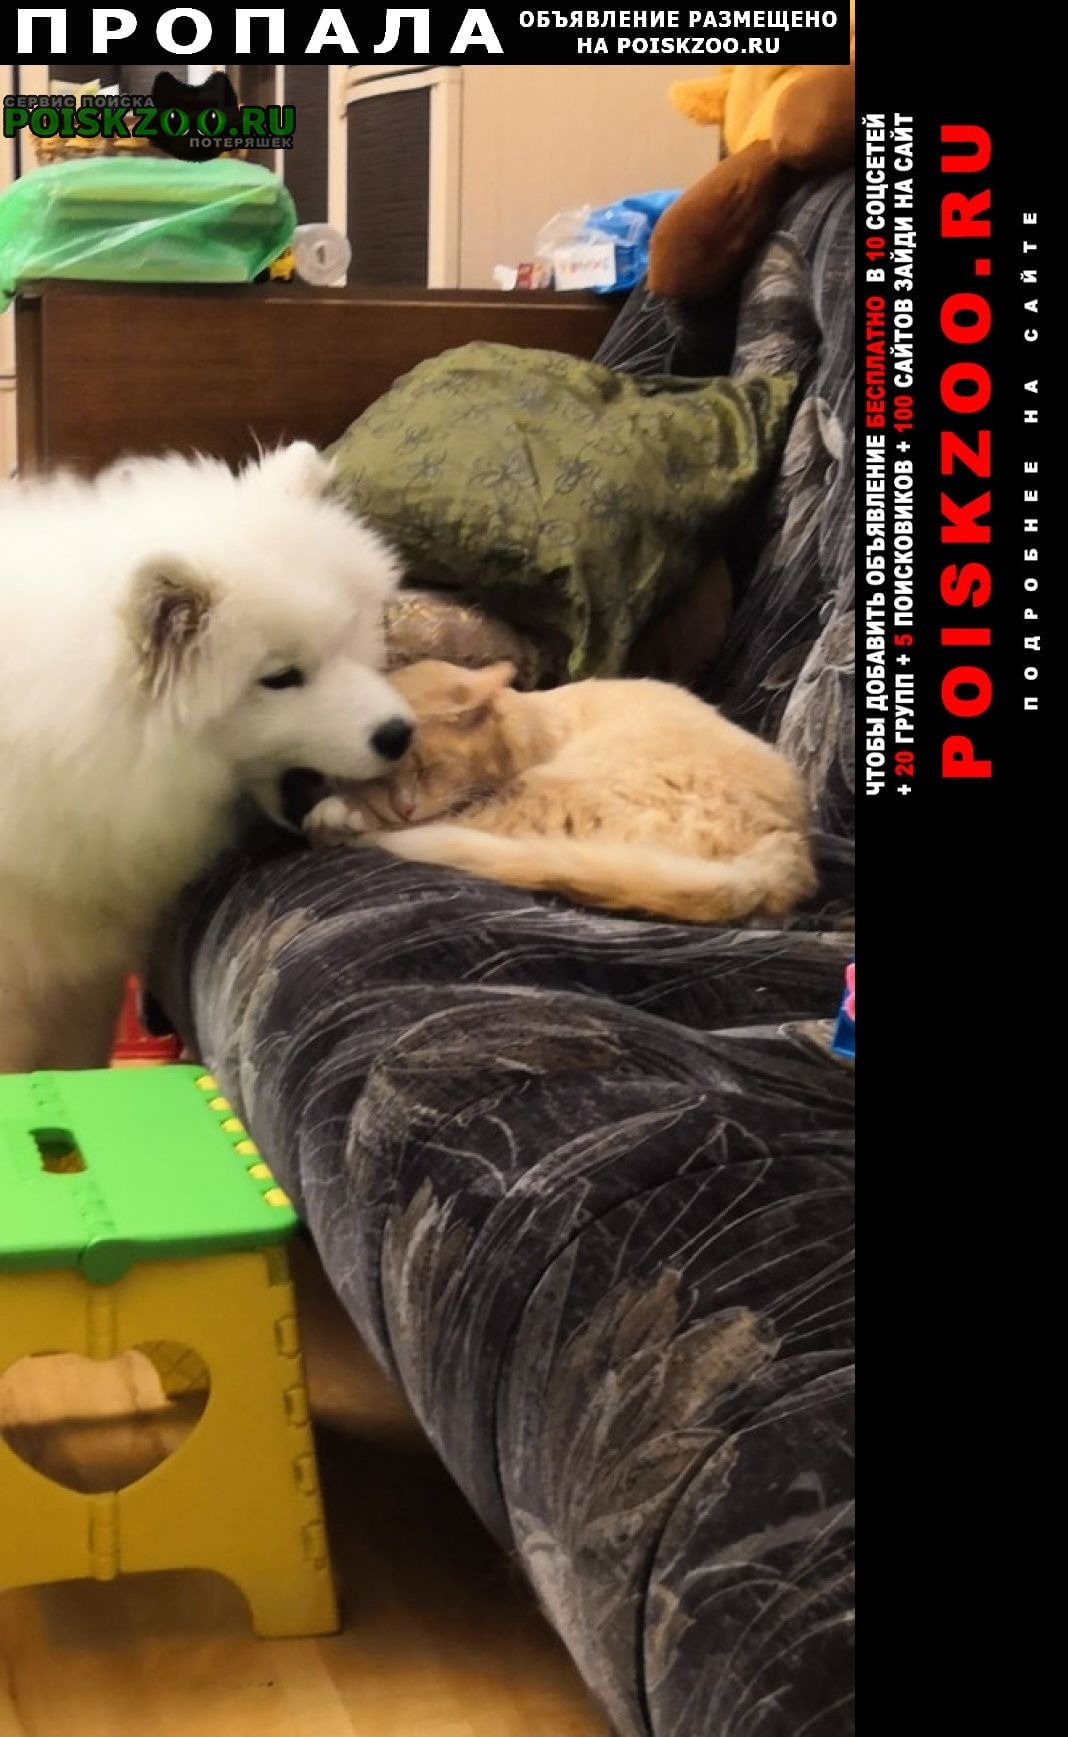 Пропала собака самоед умка Щекино